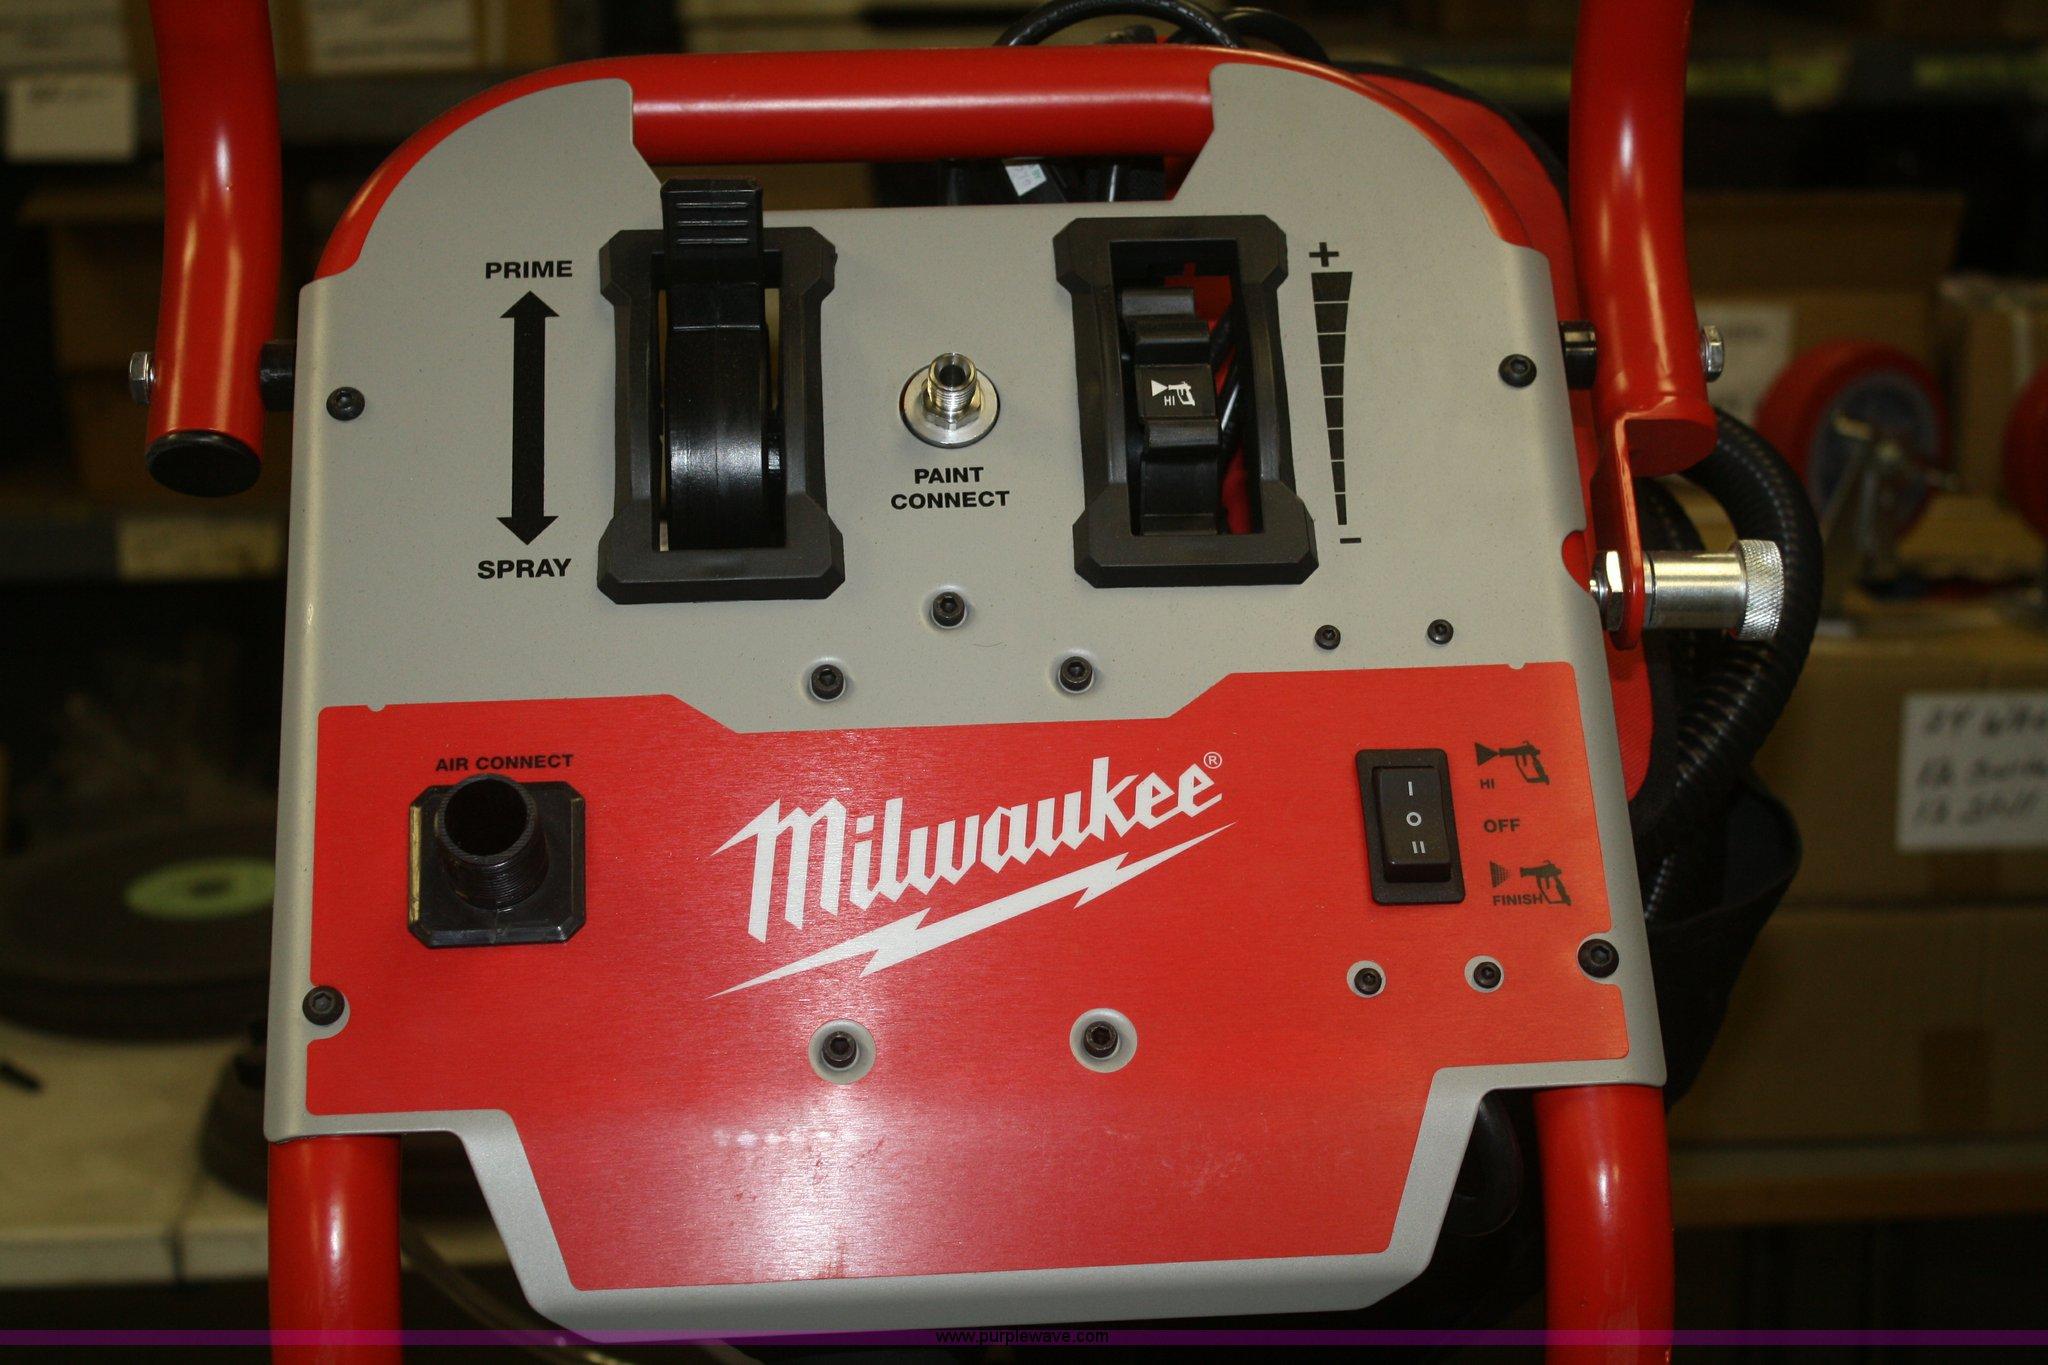 Milwaukee Airless Finish Paint Sprayer Item S9849 Sold